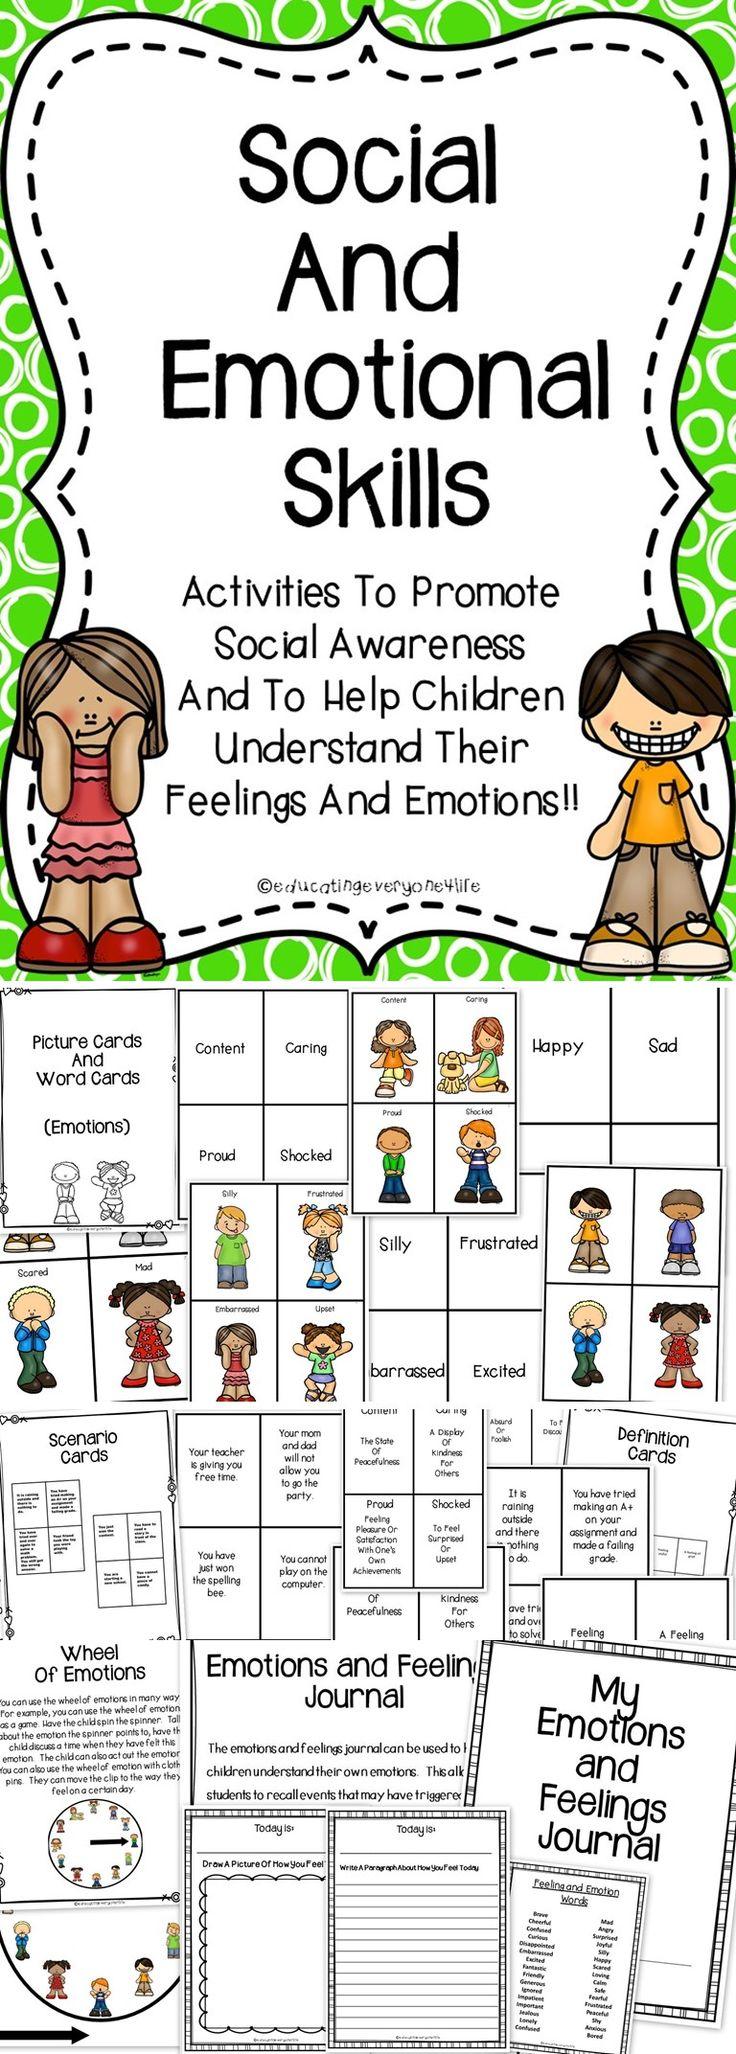 Free Worksheet Impulse Control Worksheets For Kids 17 best images about socialemotional regulation on pinterest social skills and emotional for the elementary classroom